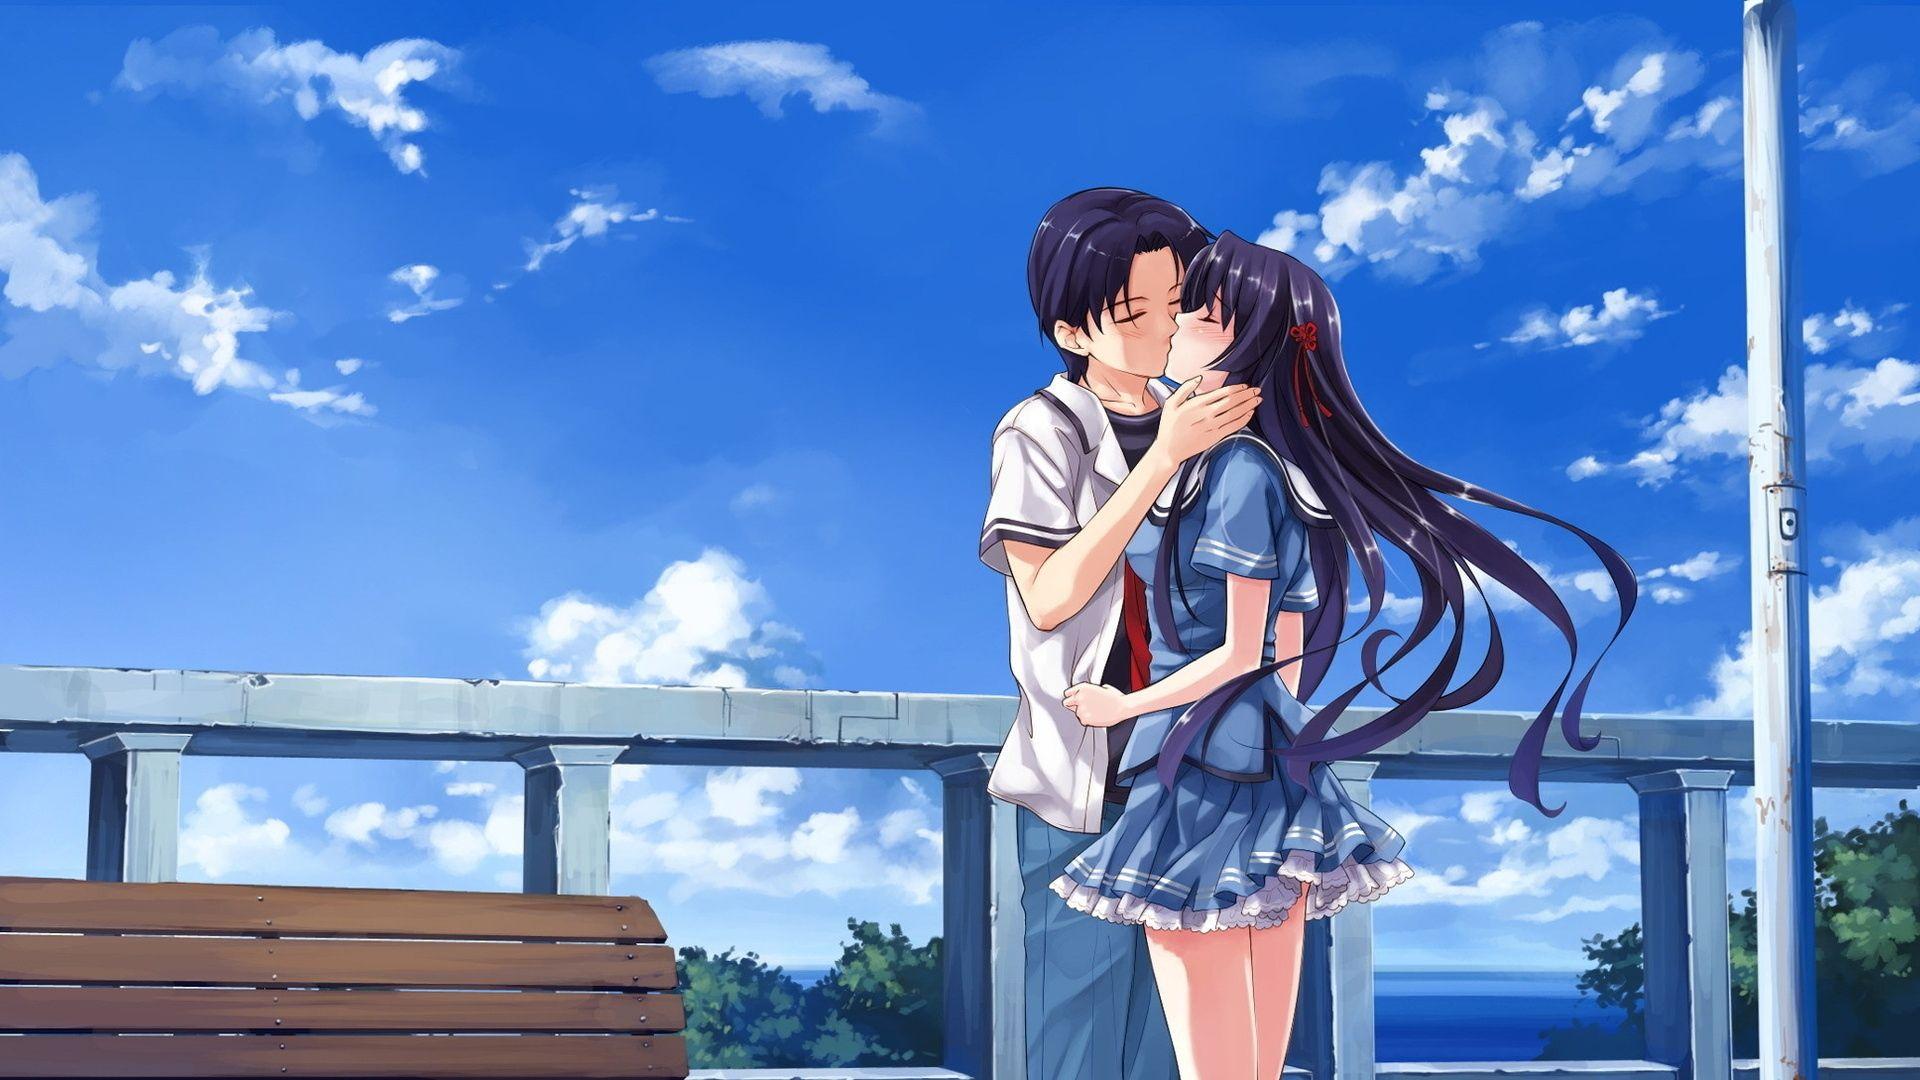 Download Wallpaper 1920x1080 Boy Girl Kiss Sunset Flowers Full Hd 1080p Hd Background Anime Deep Blue Sky Boy And Girl Kiss